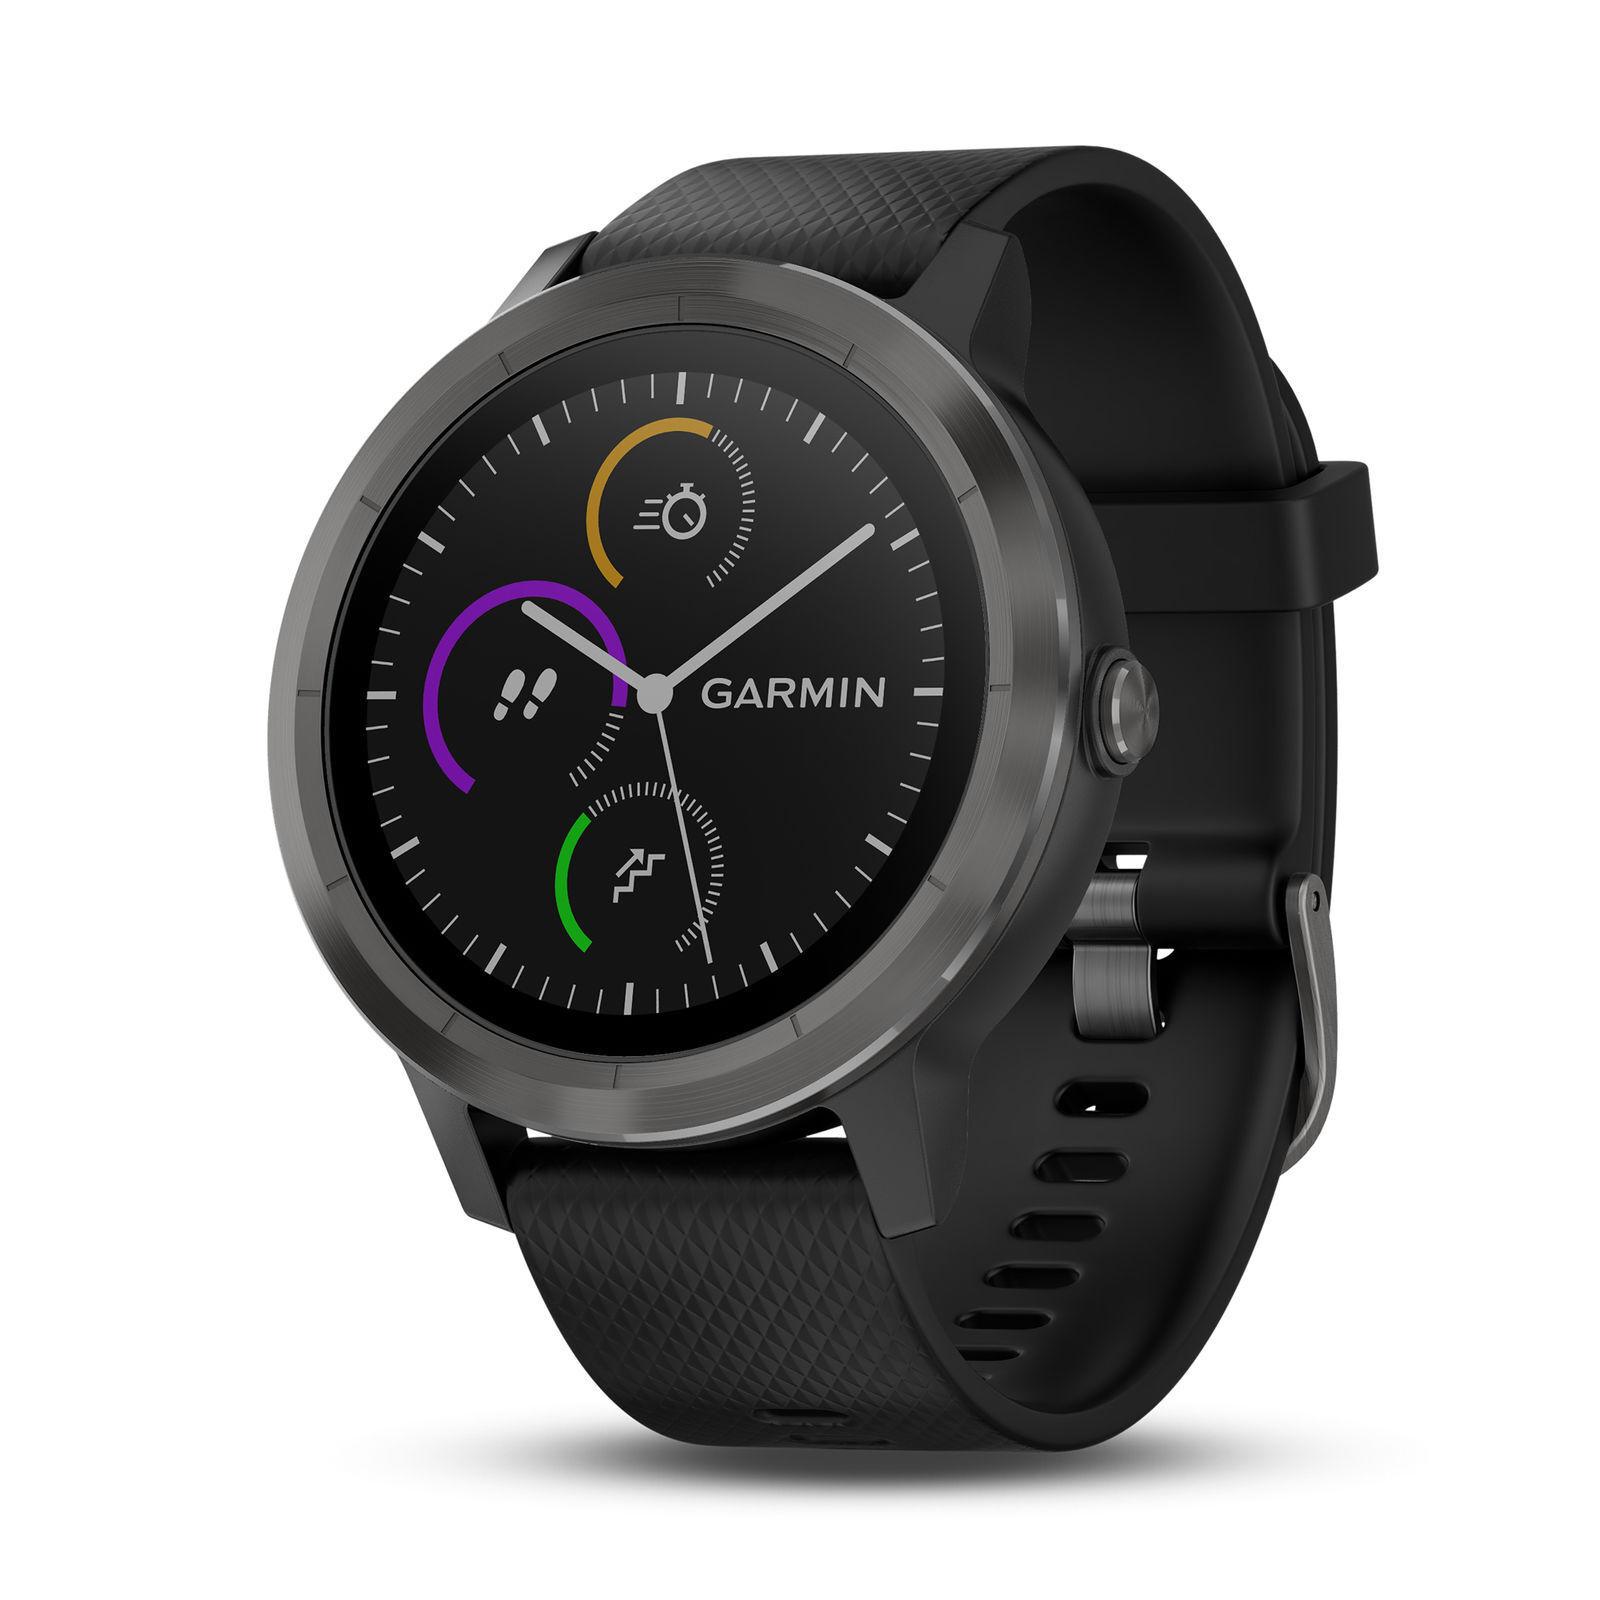 Garmin Vivoactive 3 3 3 GPS Smartwatch Schwarz/Rotguss 010-01769-11 c3c104